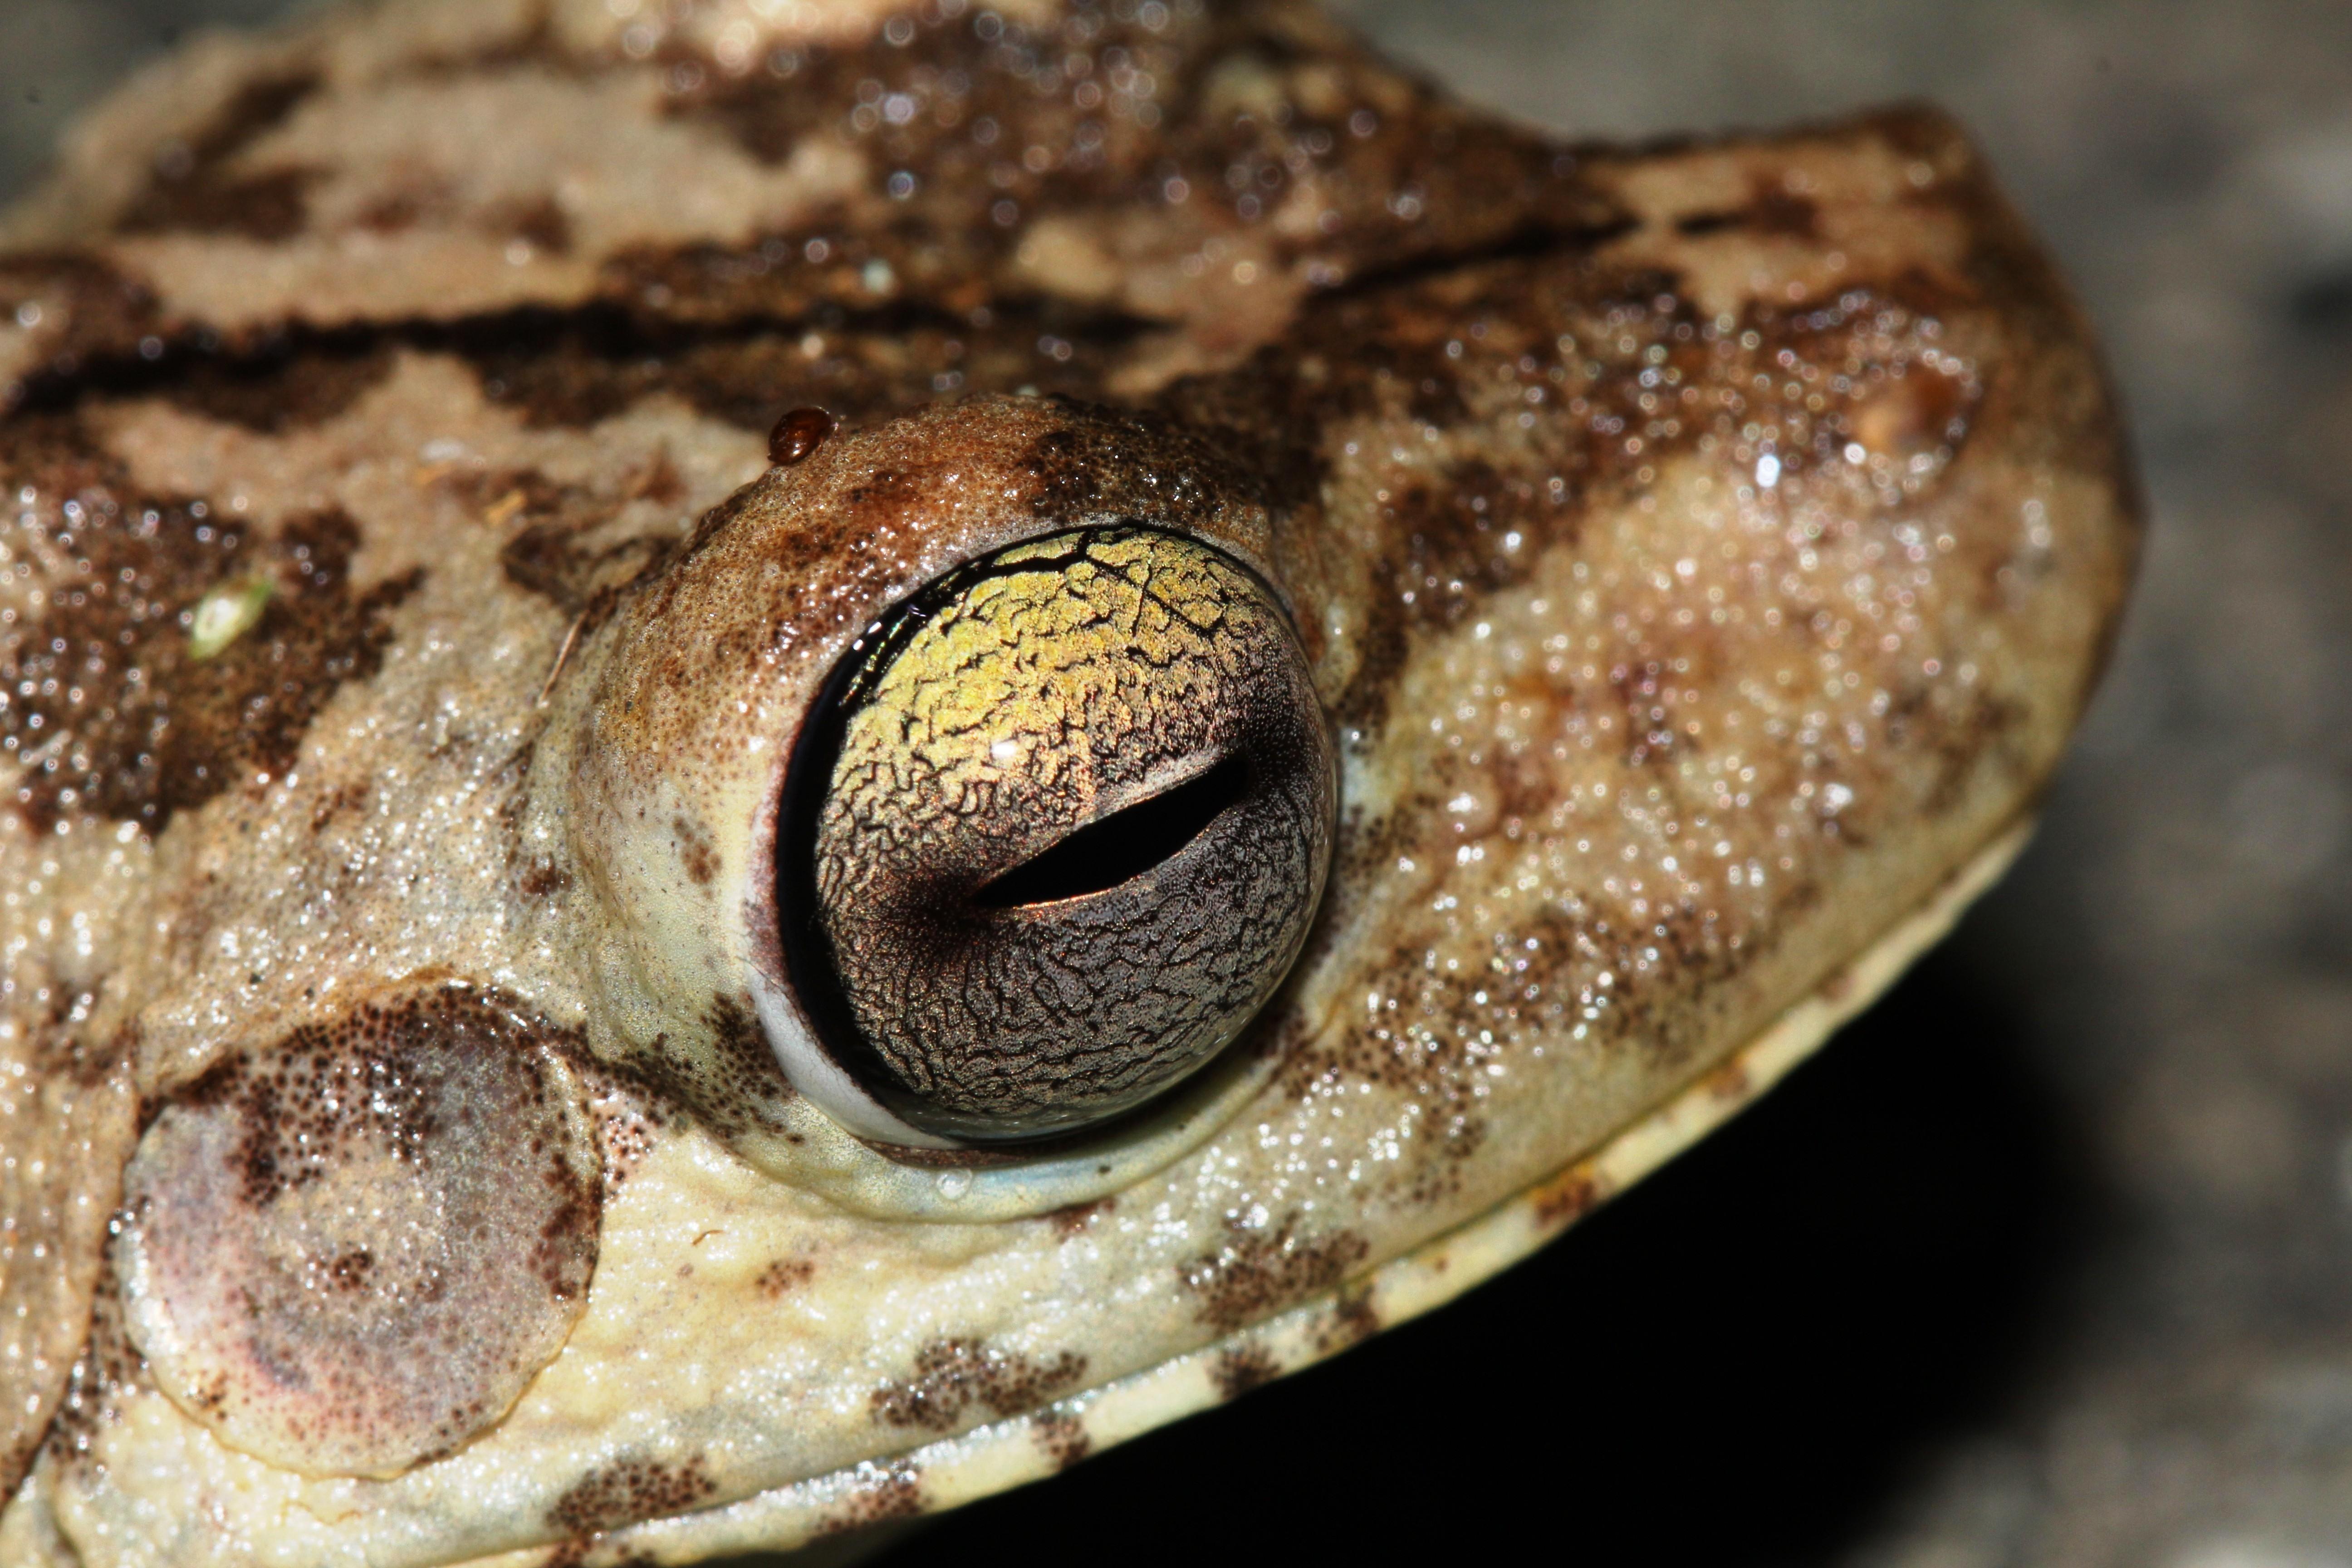 Gladitator frog (Hypsiboas rosenbergi)